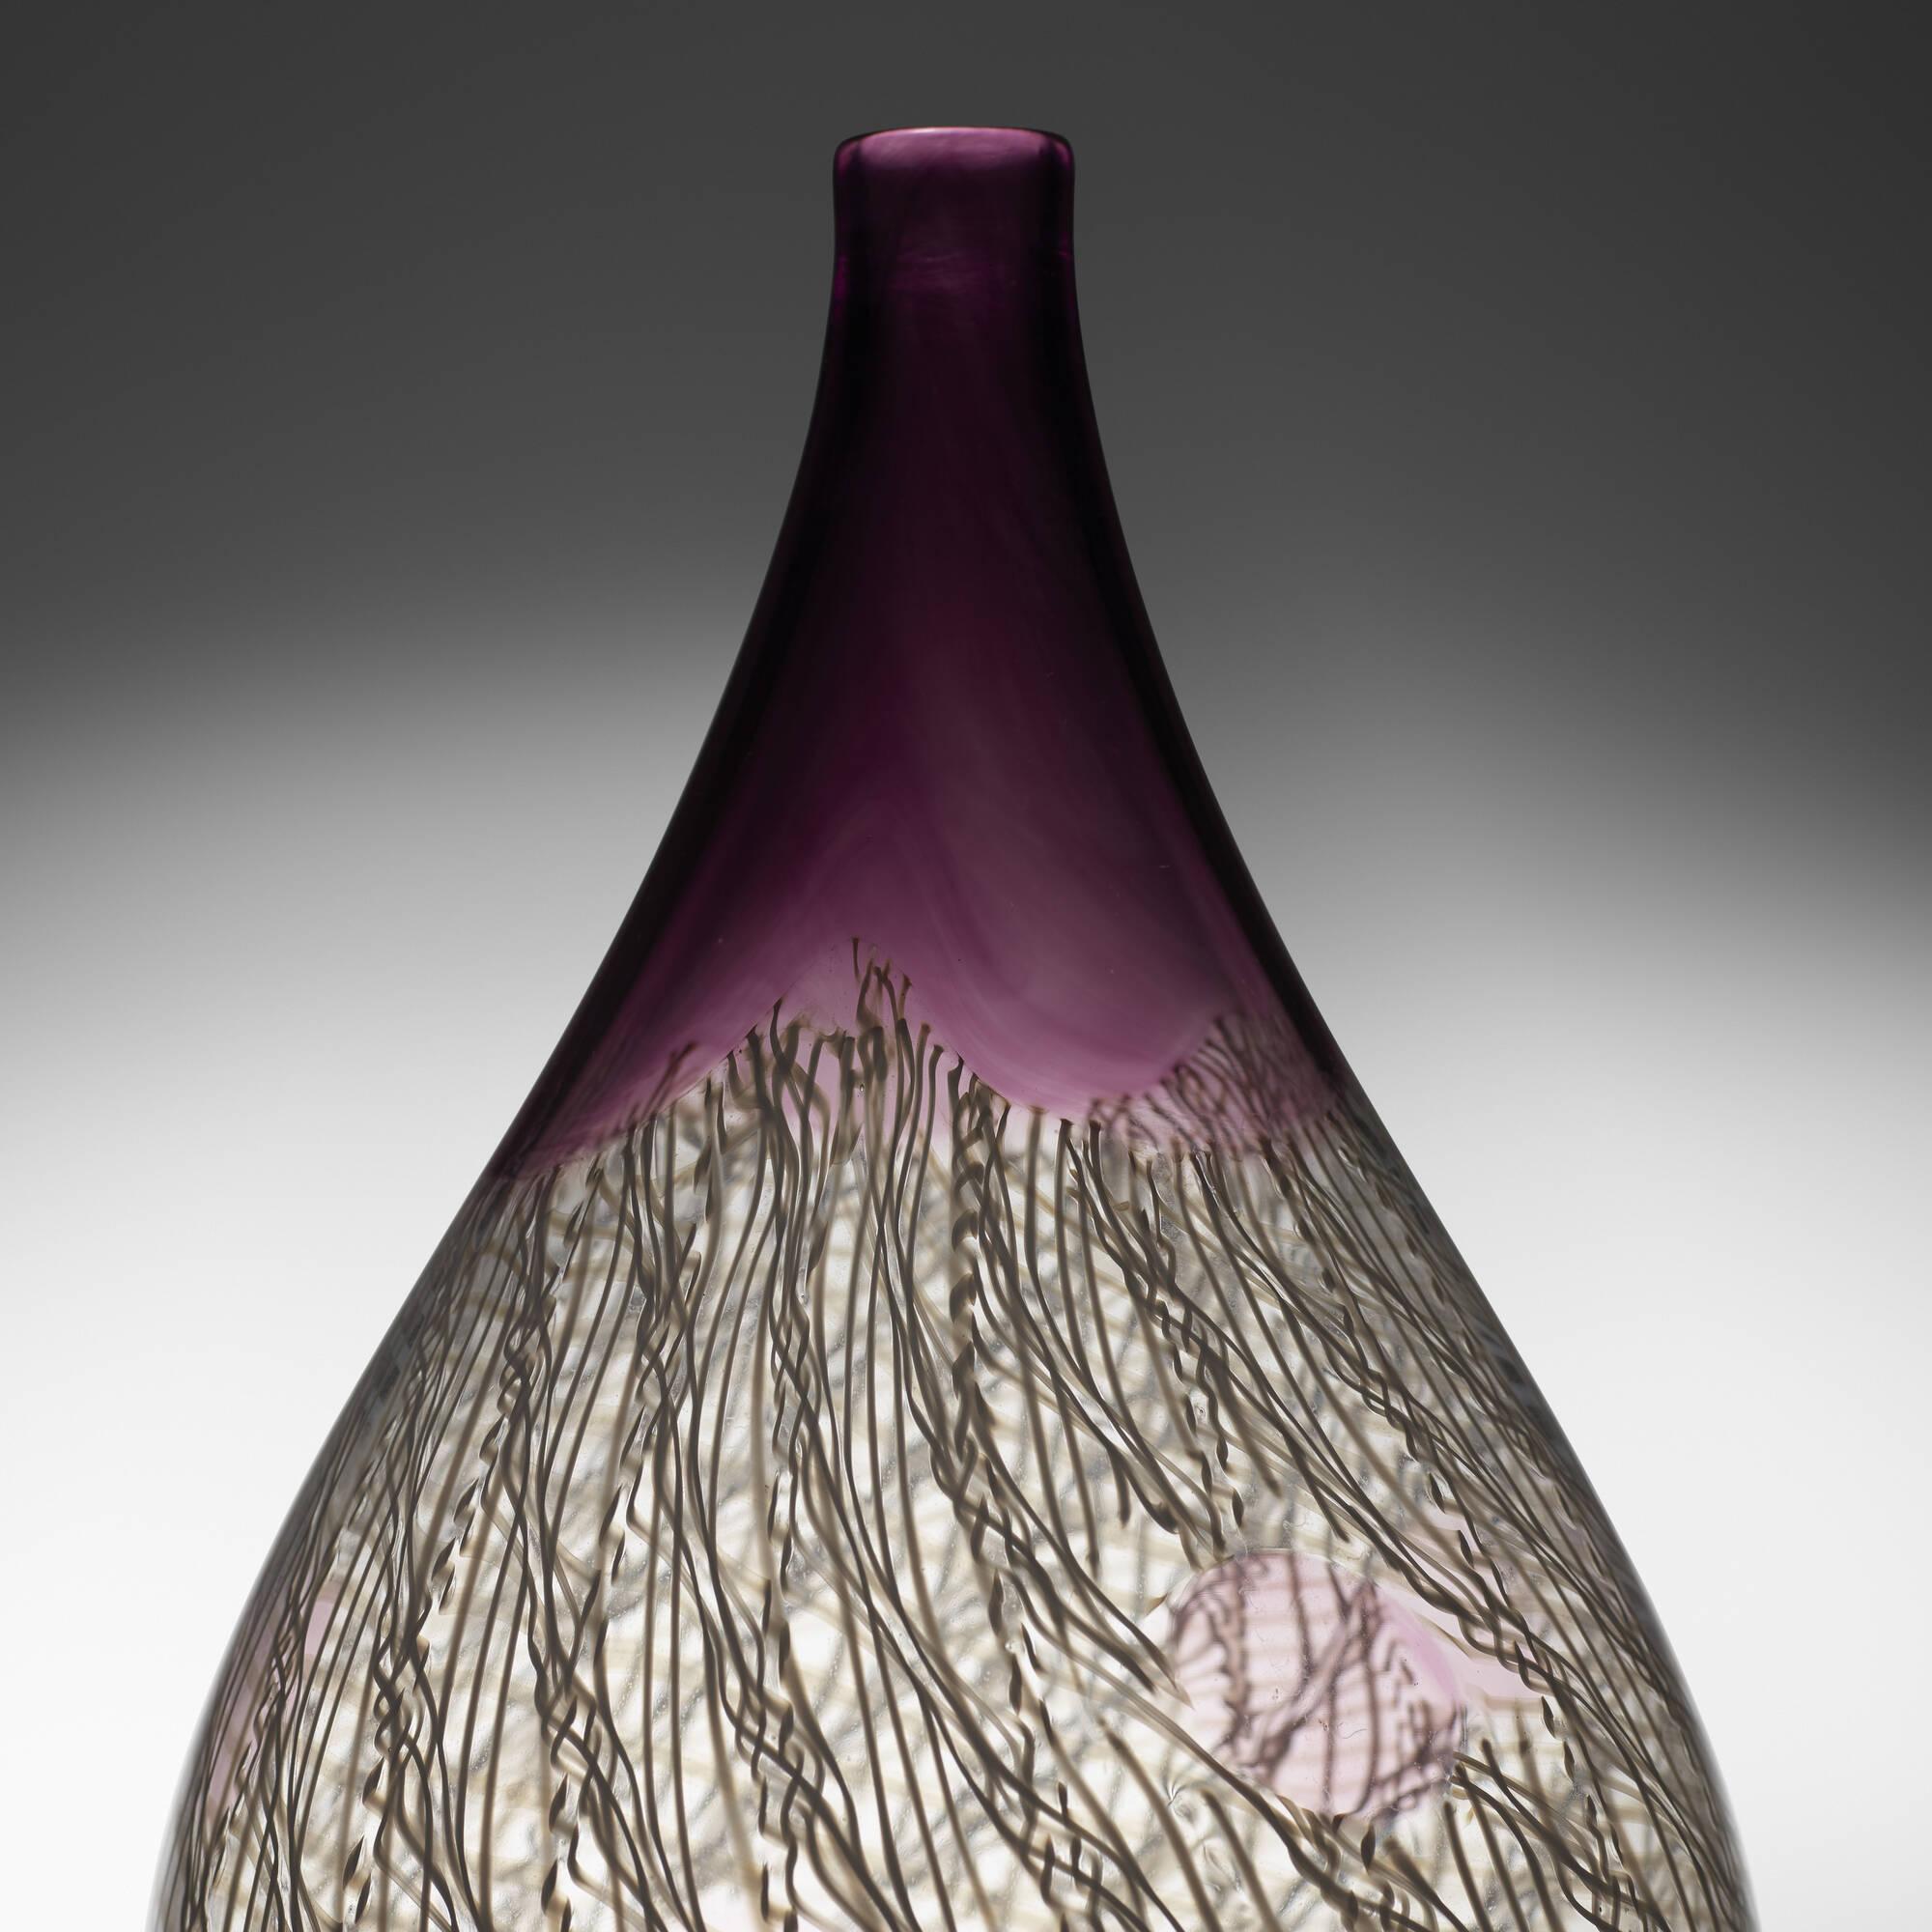 44: Archimede Seguso / Merletto vase (2 of 3)